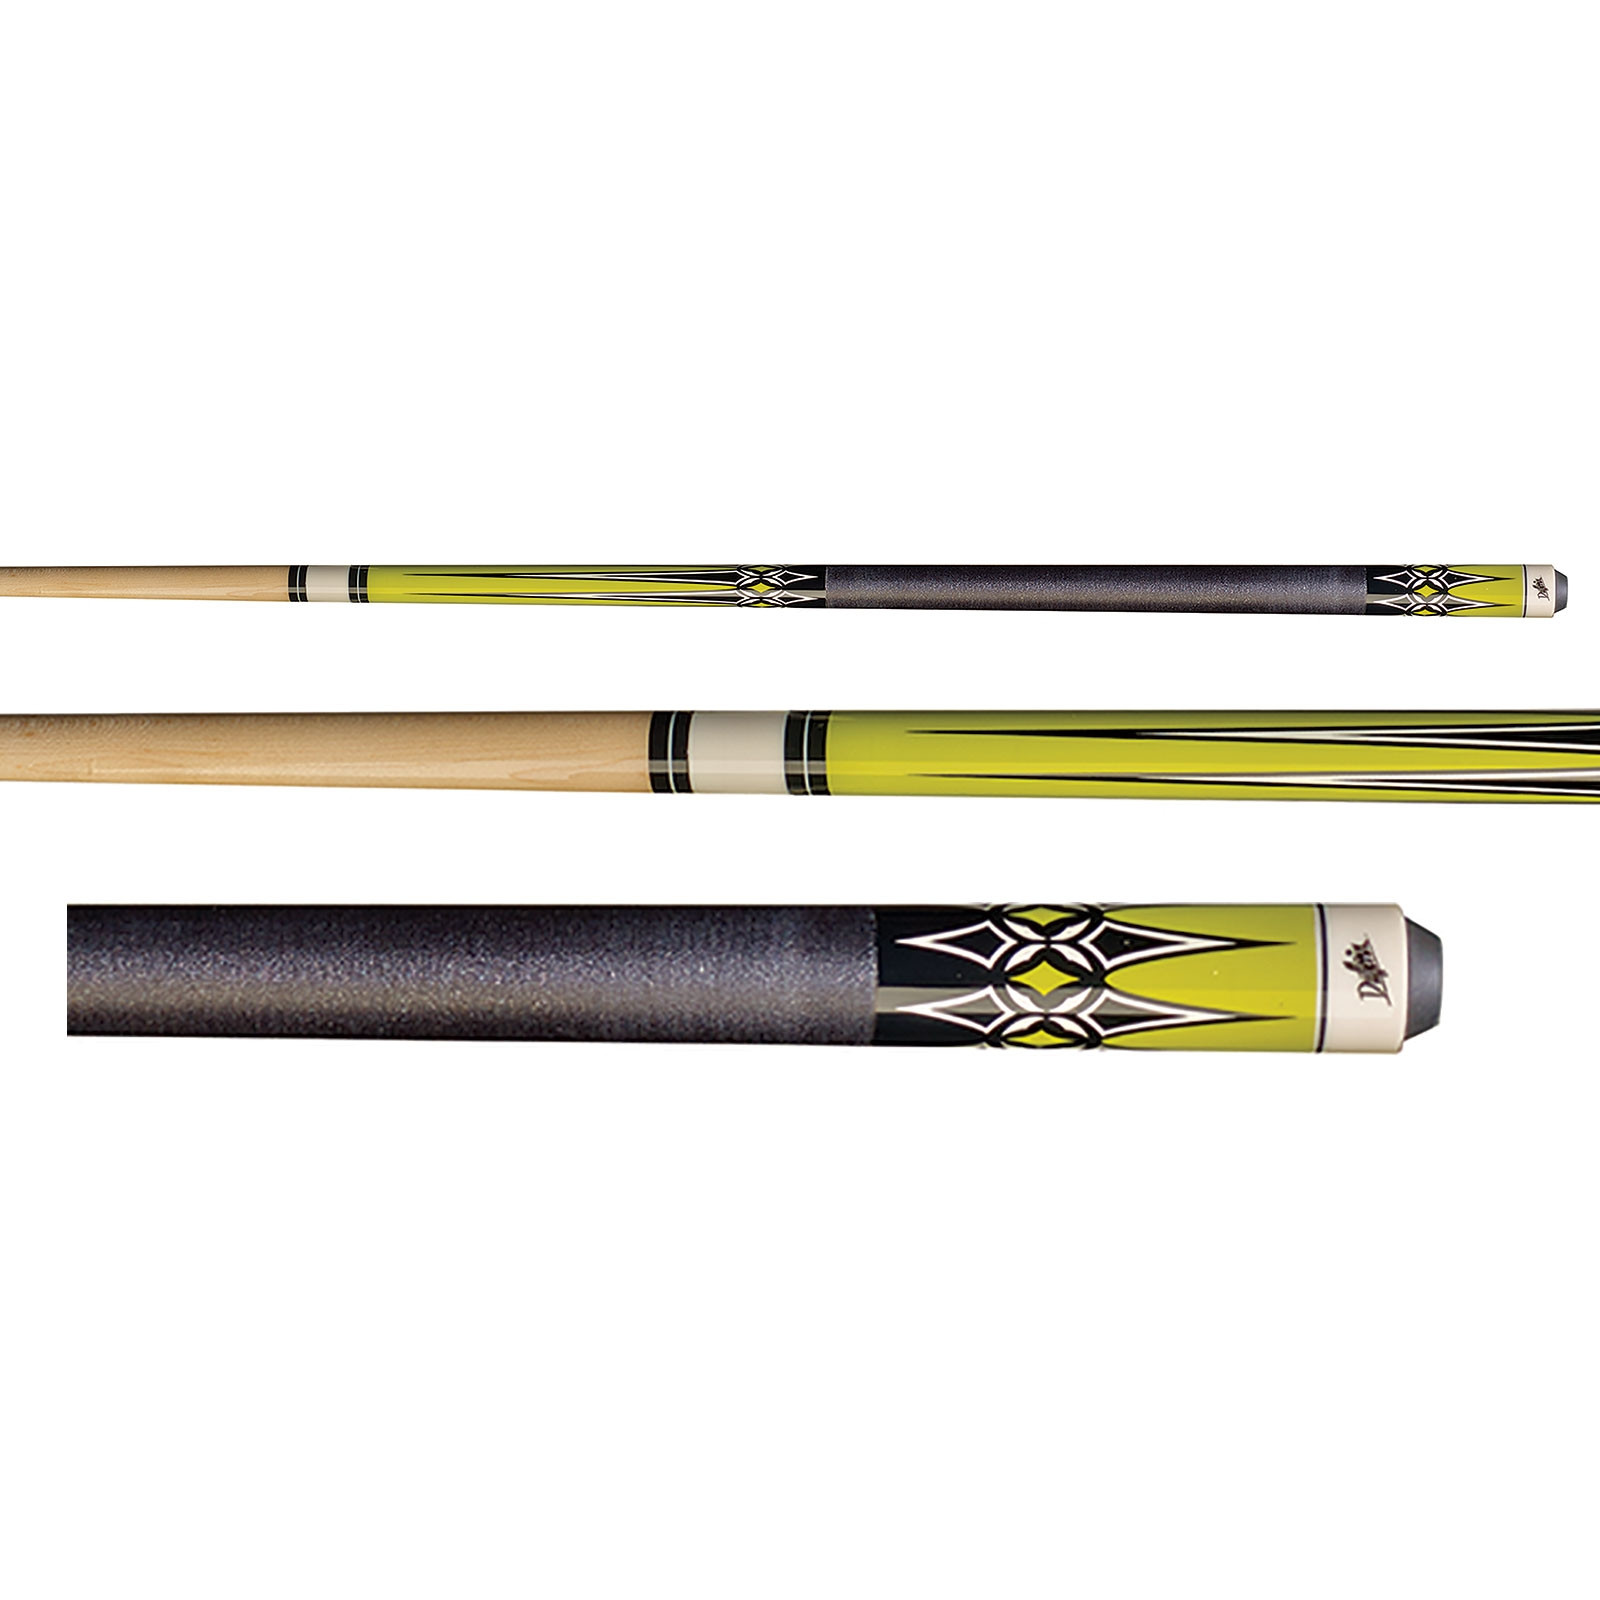 Dufferin D-332G Green Pool Cue Stick